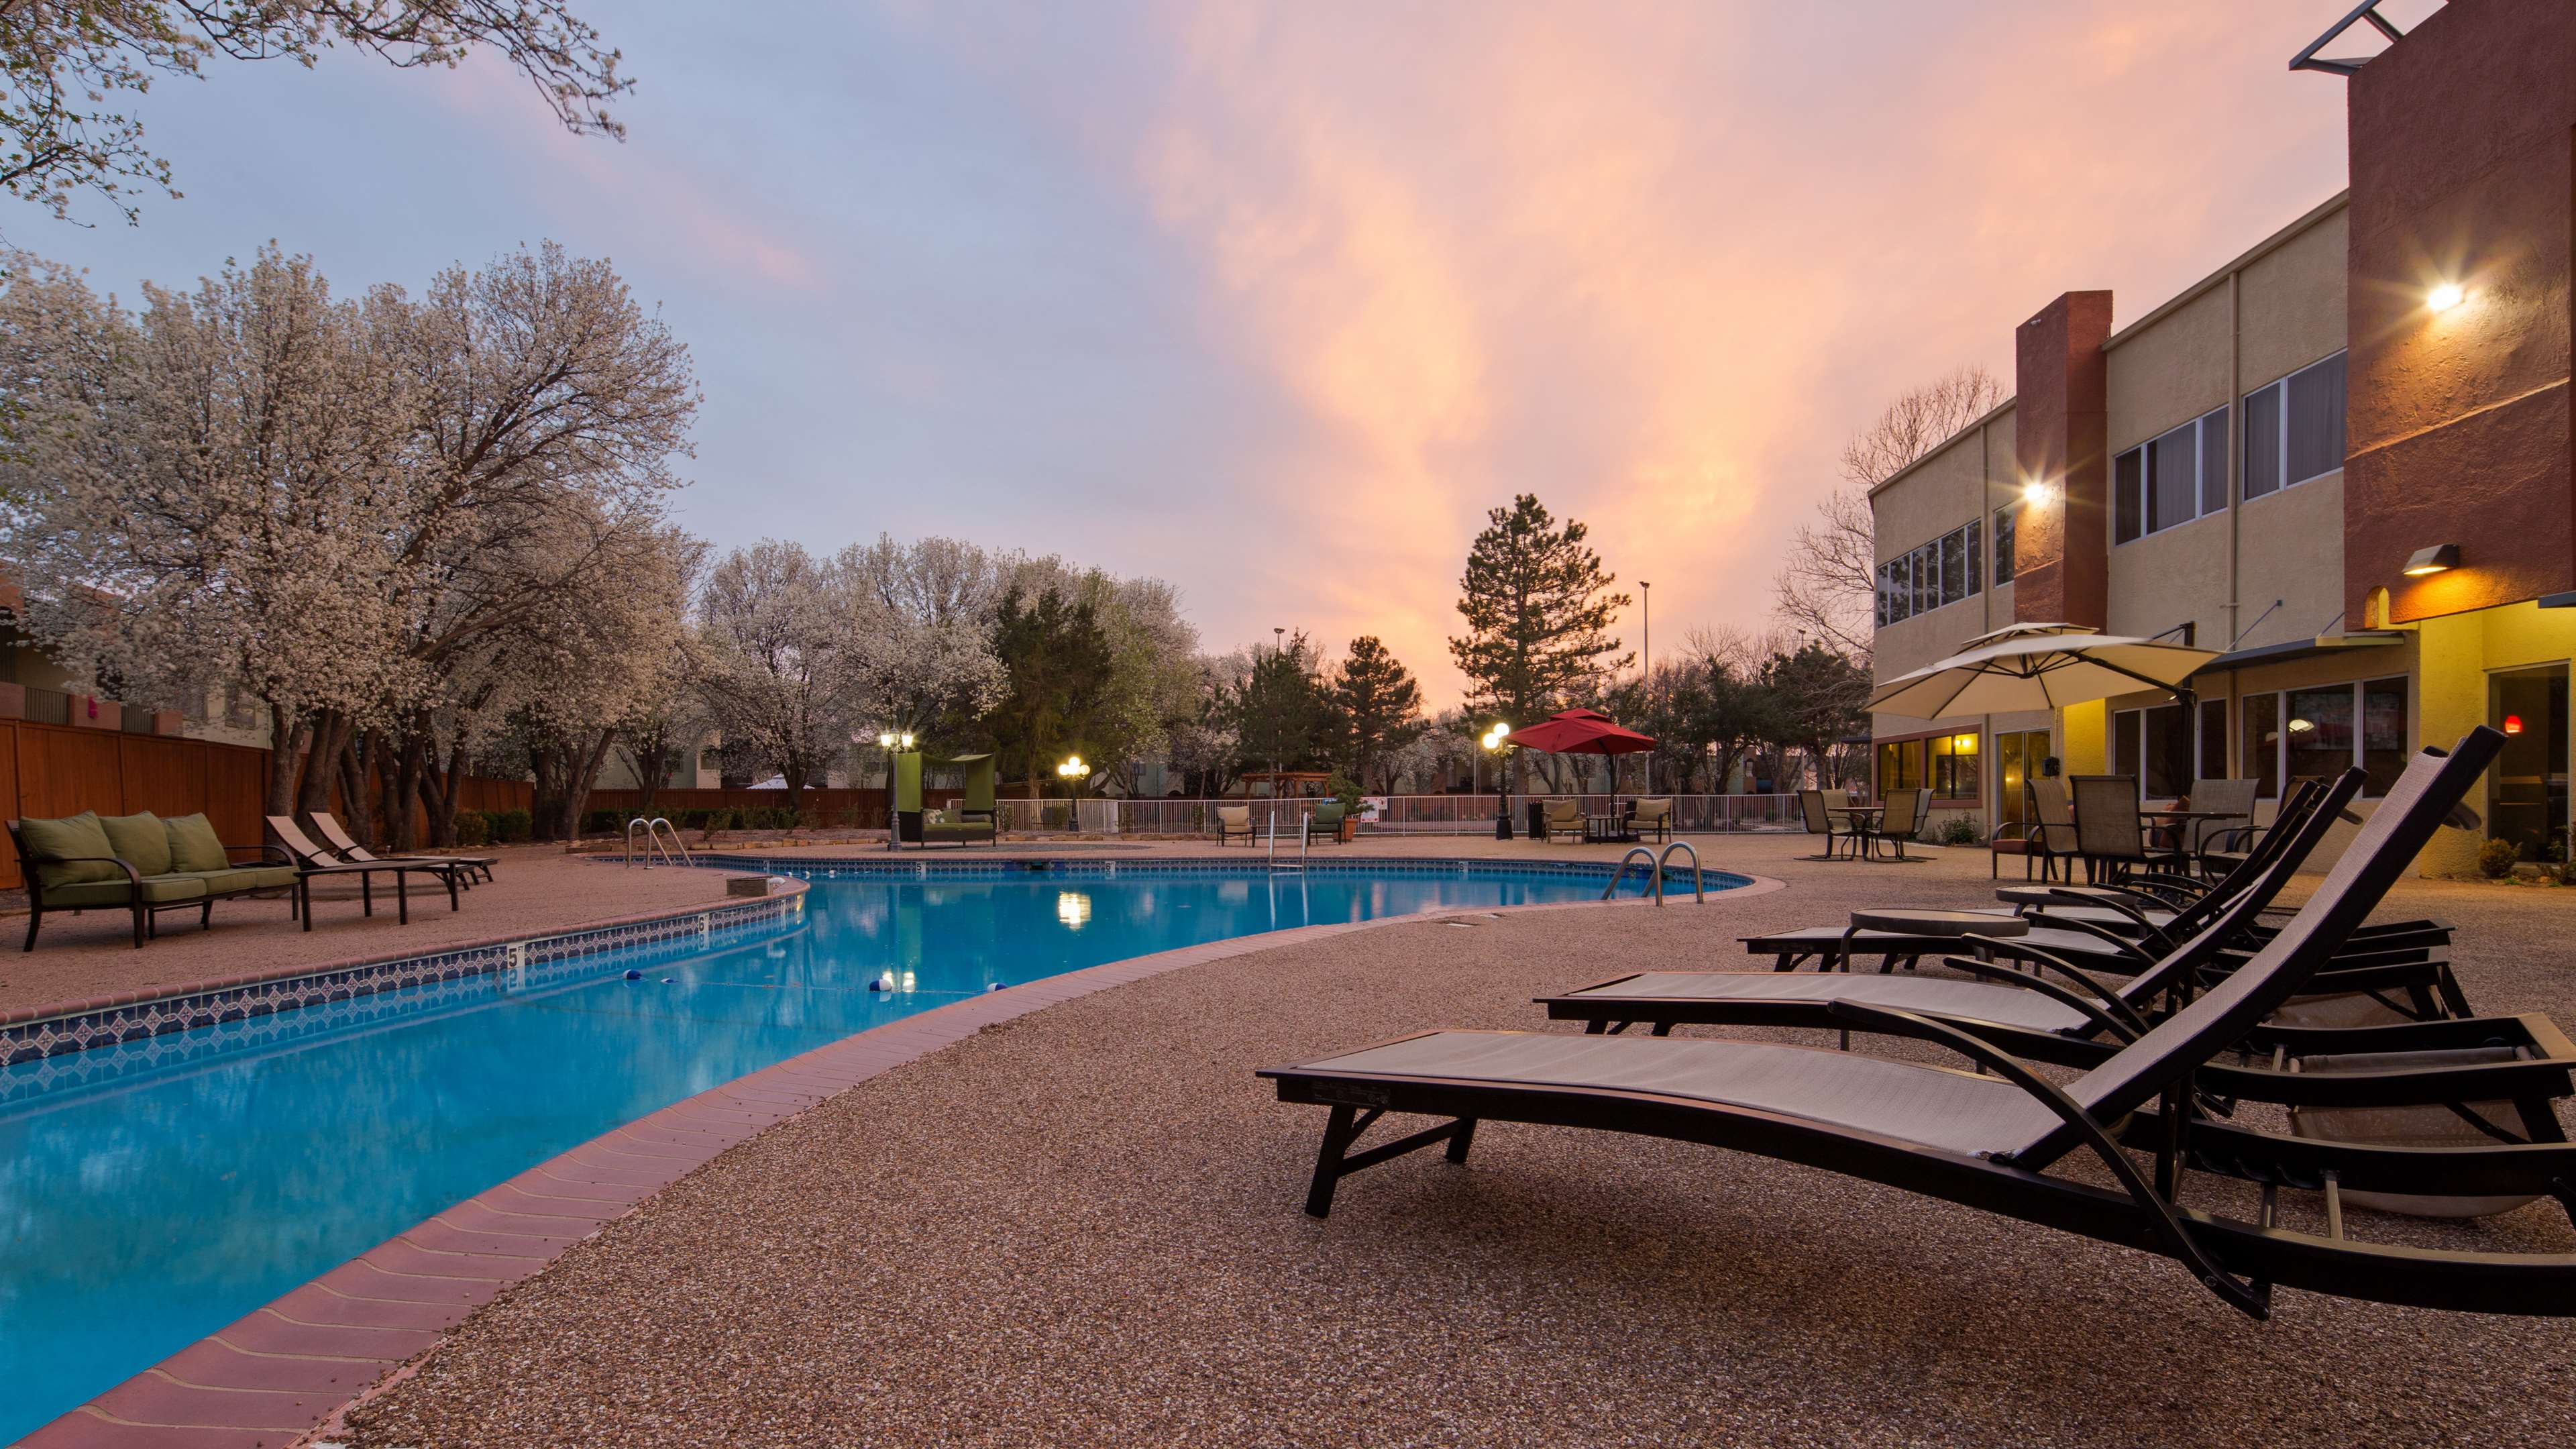 Best Western Plus Lawton Hotel & Convention Center image 5